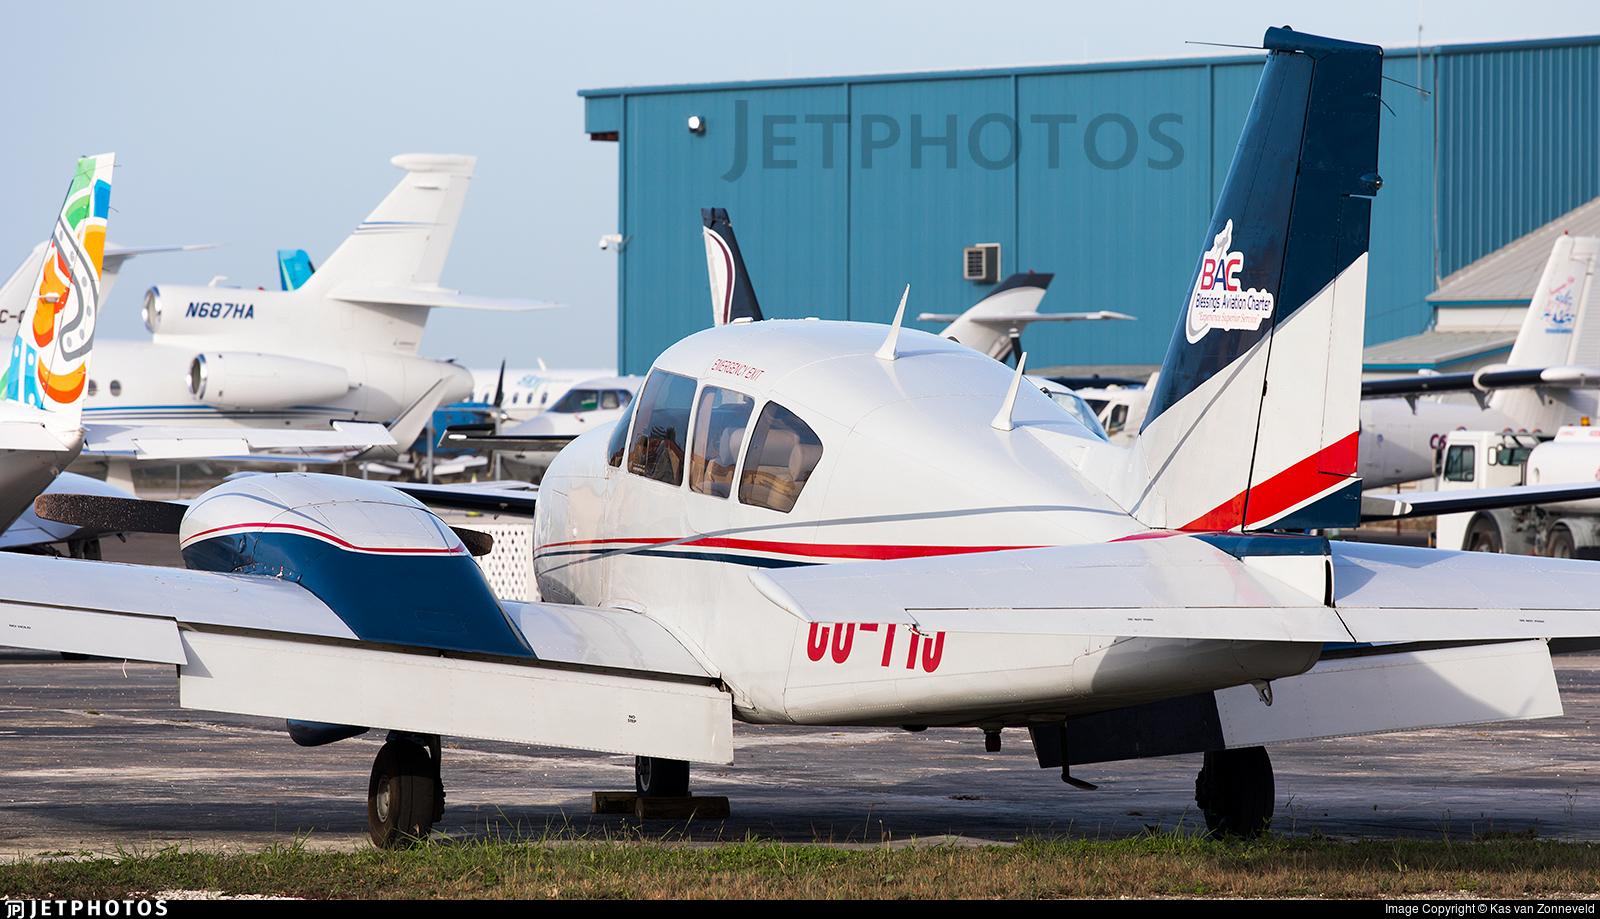 C6-TTJ - Piper PA-23-250 Aztec E - Blessings Aviation Charter (BAC)